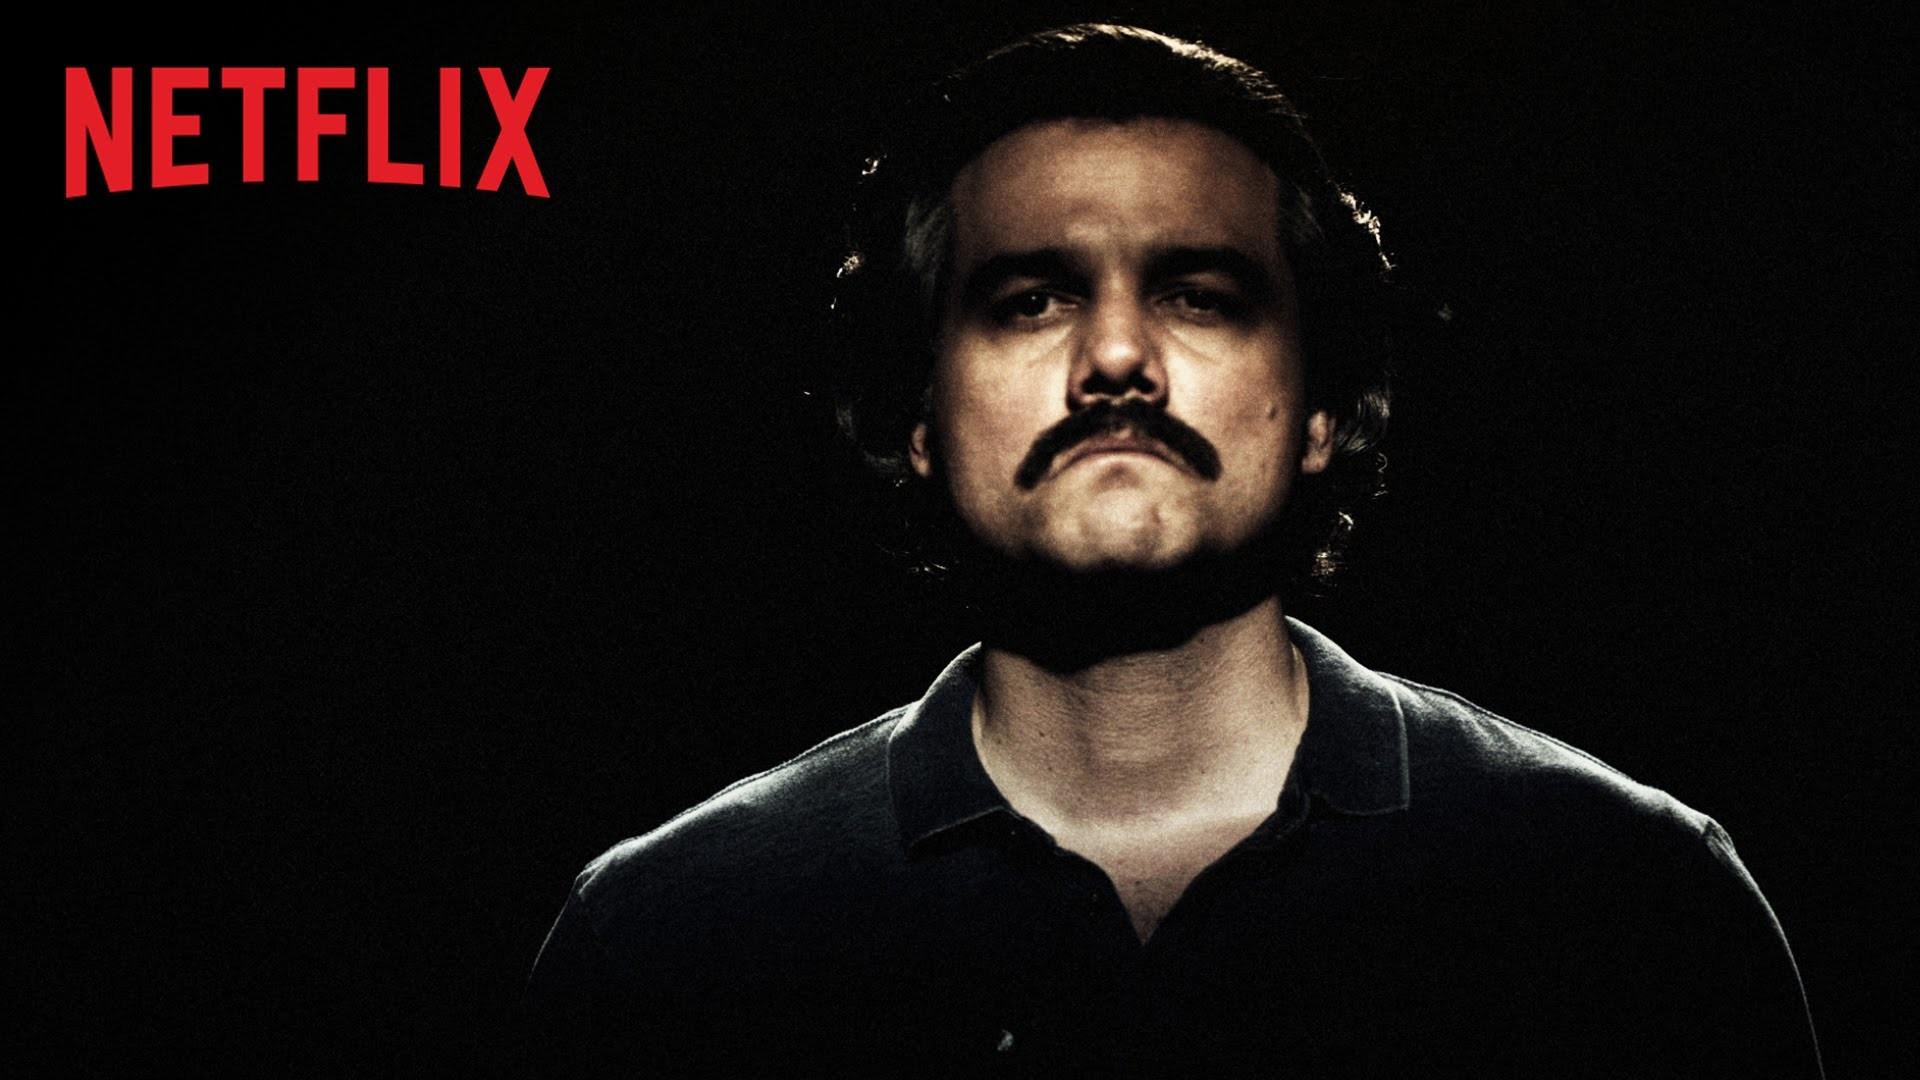 narcos season 1 all episodes download